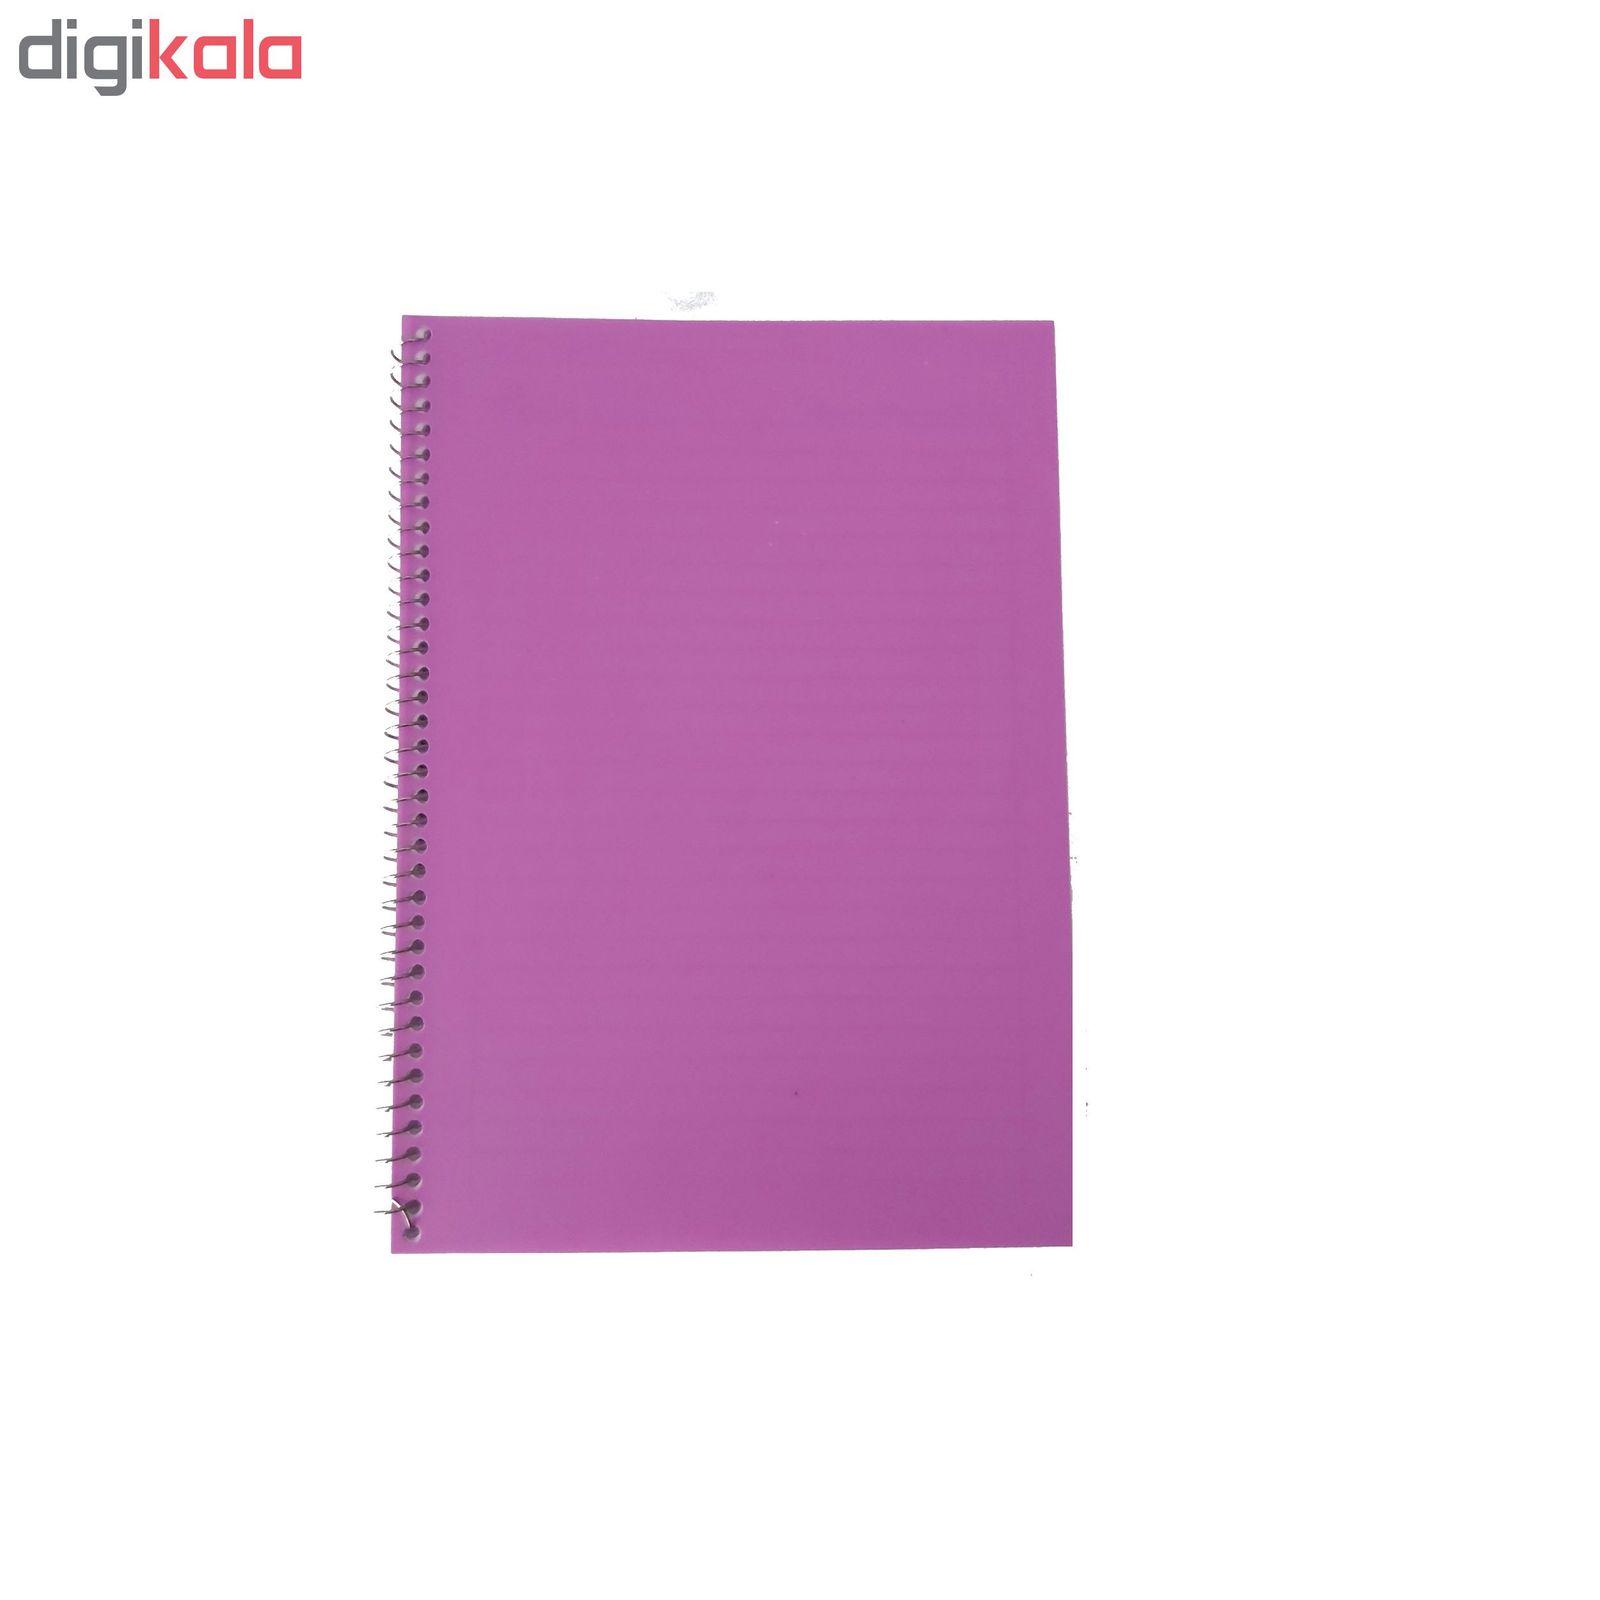 دفتر مشق کد DM02 main 1 4